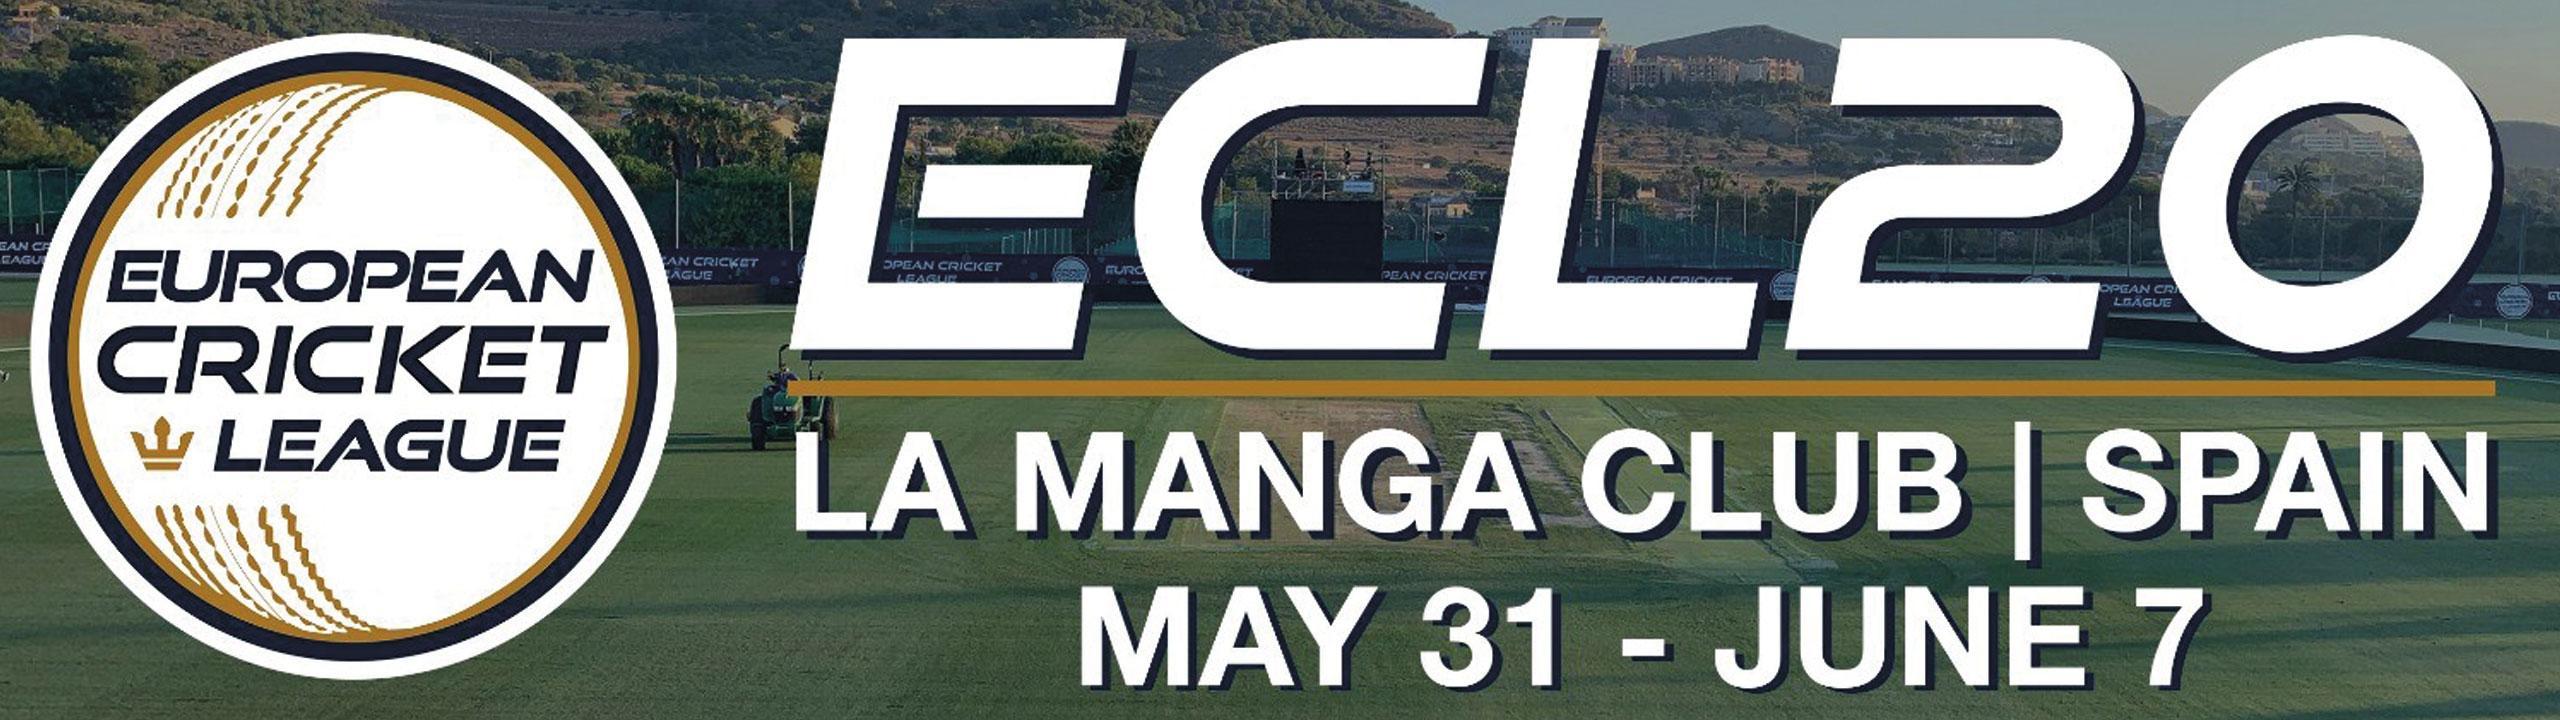 la-manga-club-ecl20_1